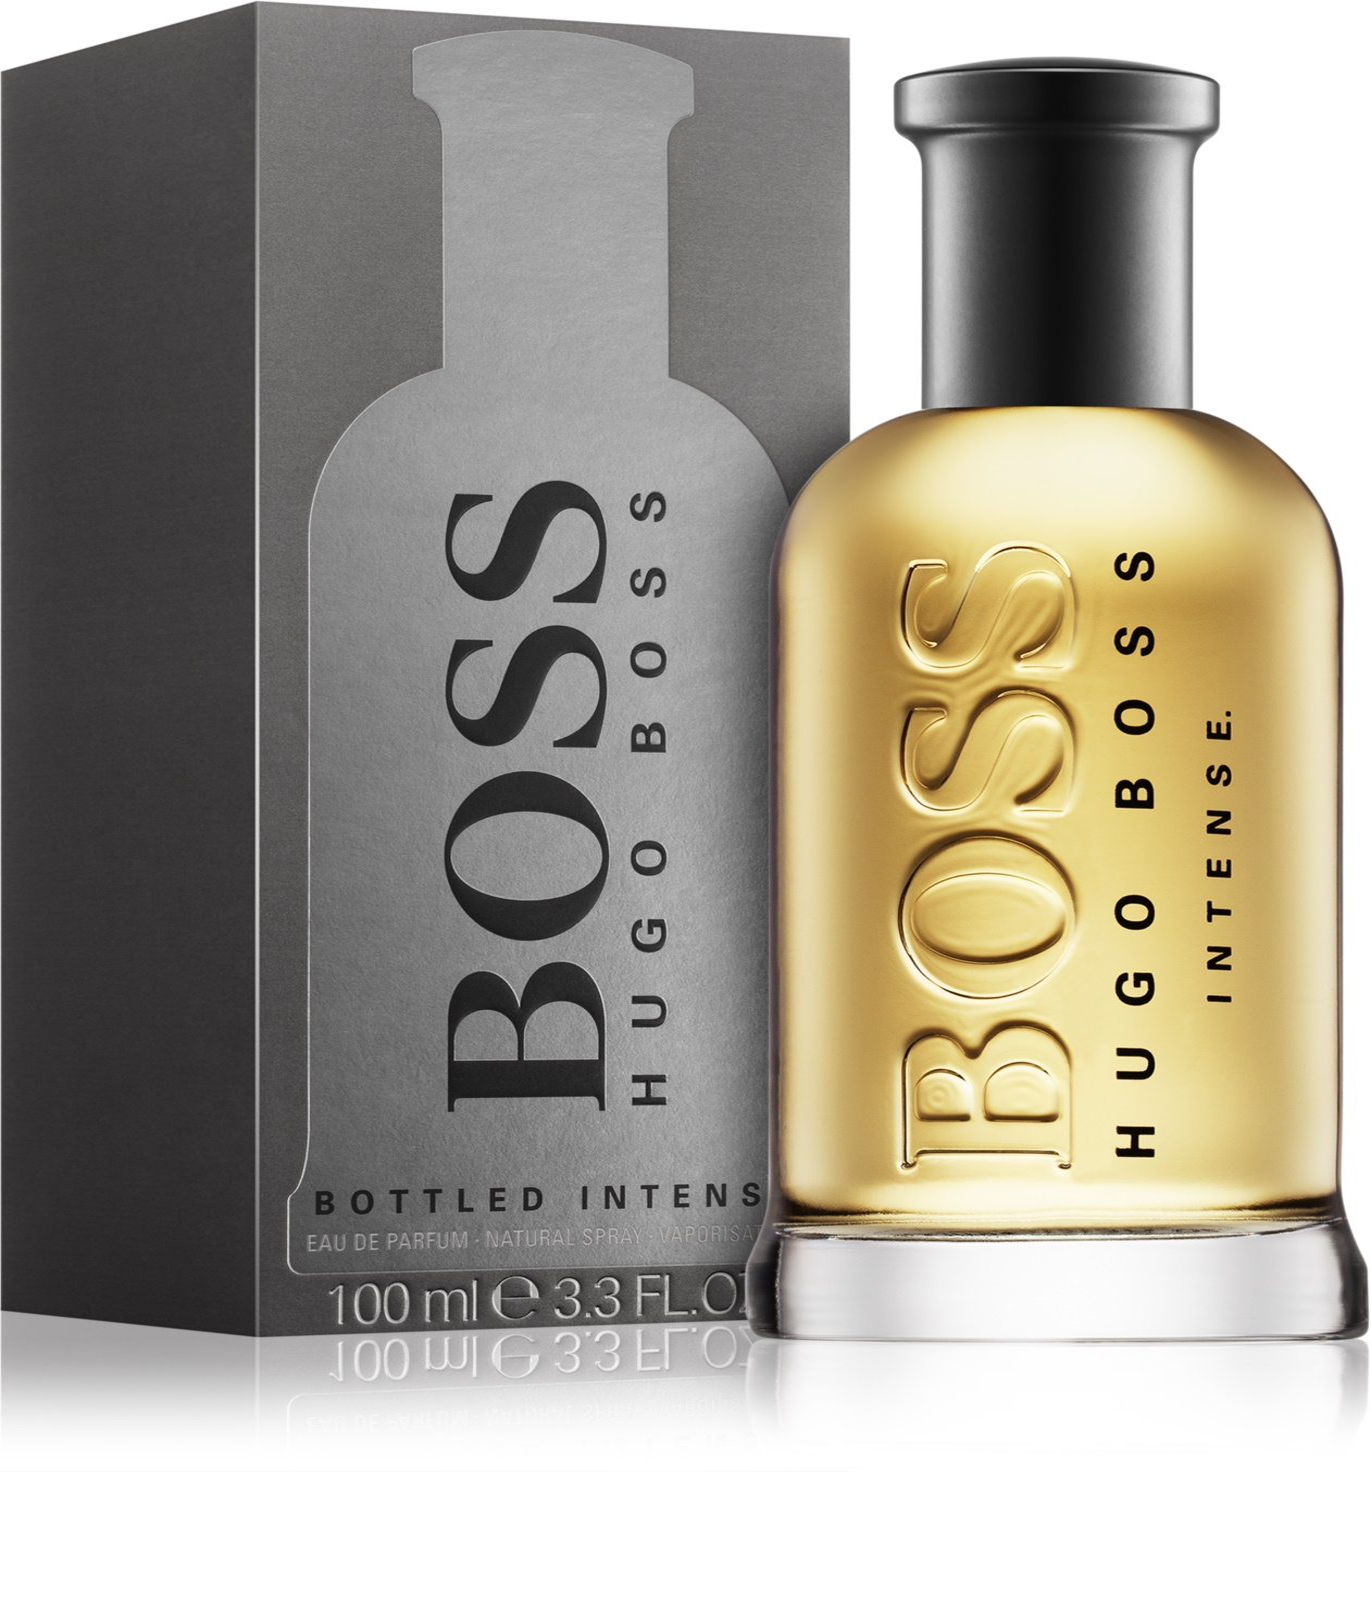 [notino.at] Hugo Boss Bottled Intense 100ml um 38,50€ anstatt 45€